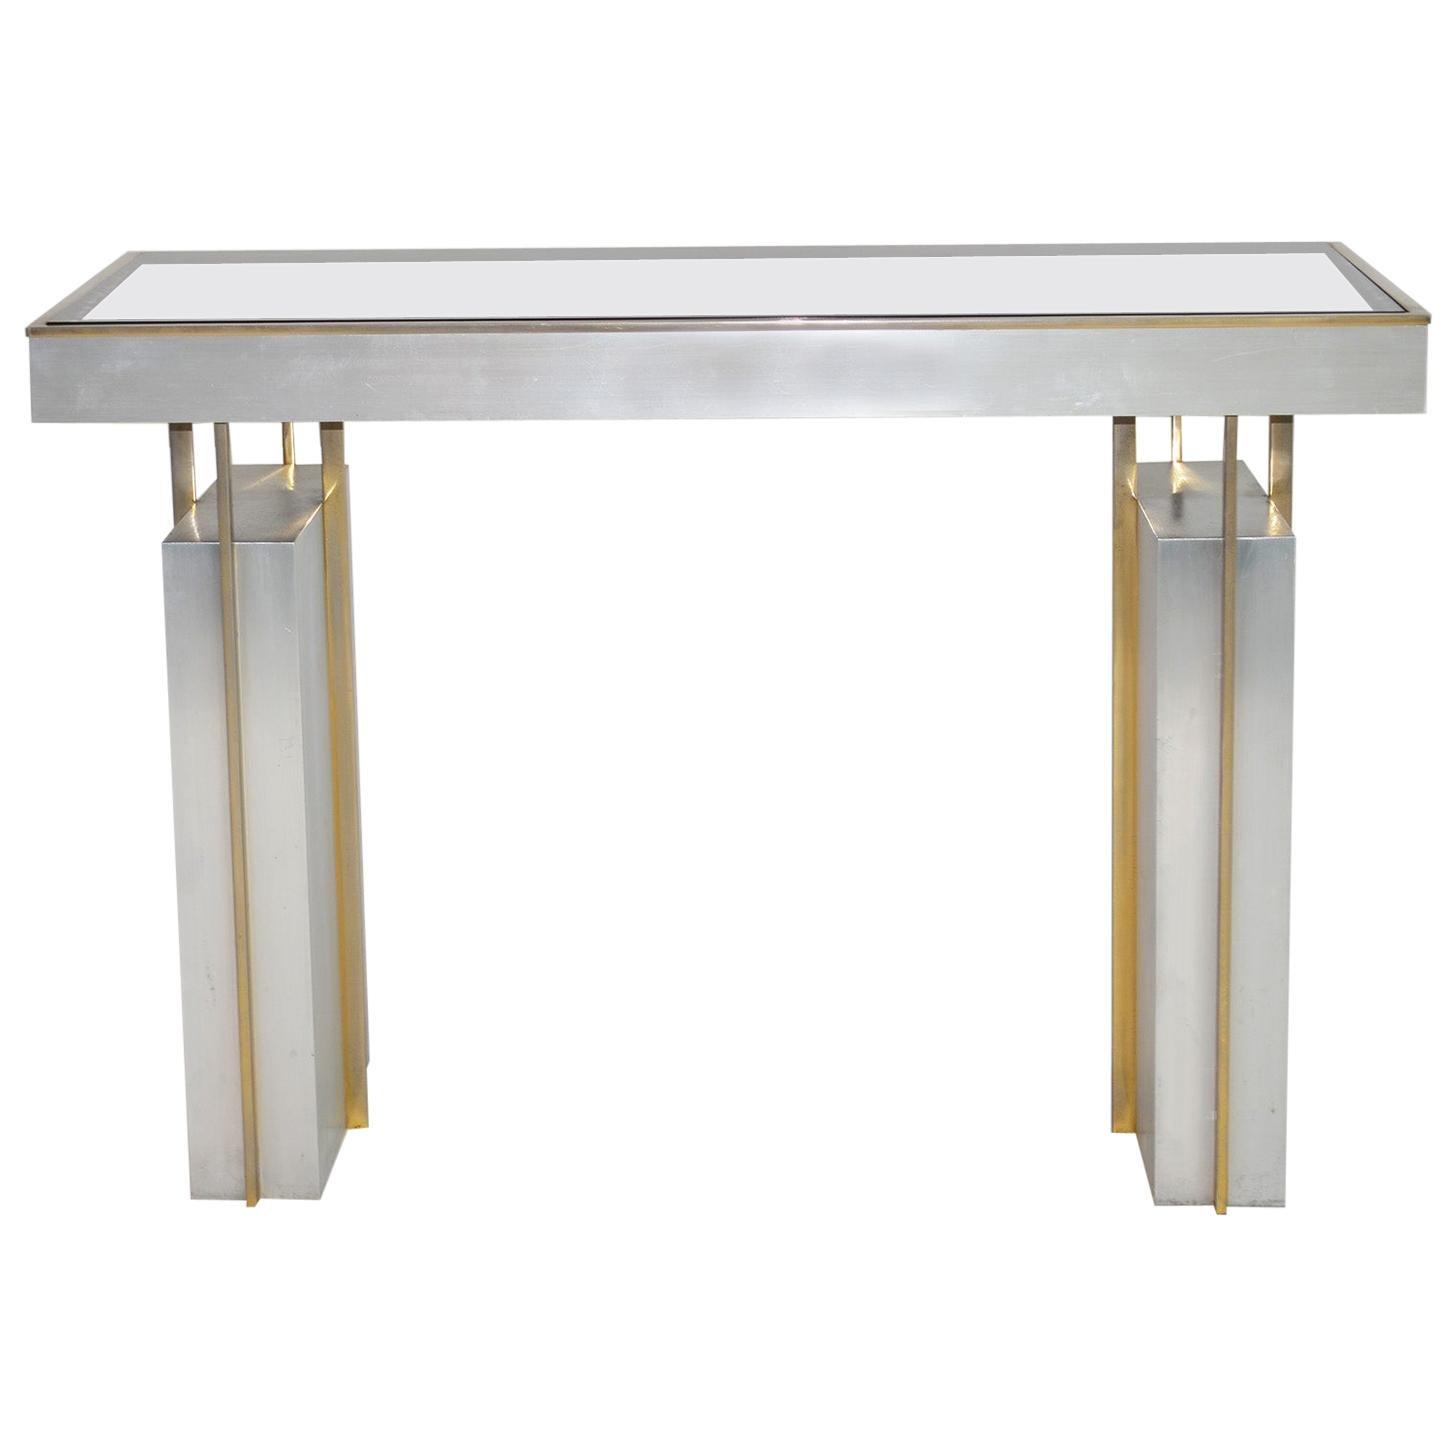 Maison Jansen Console Table or Desk, France, circa 1963